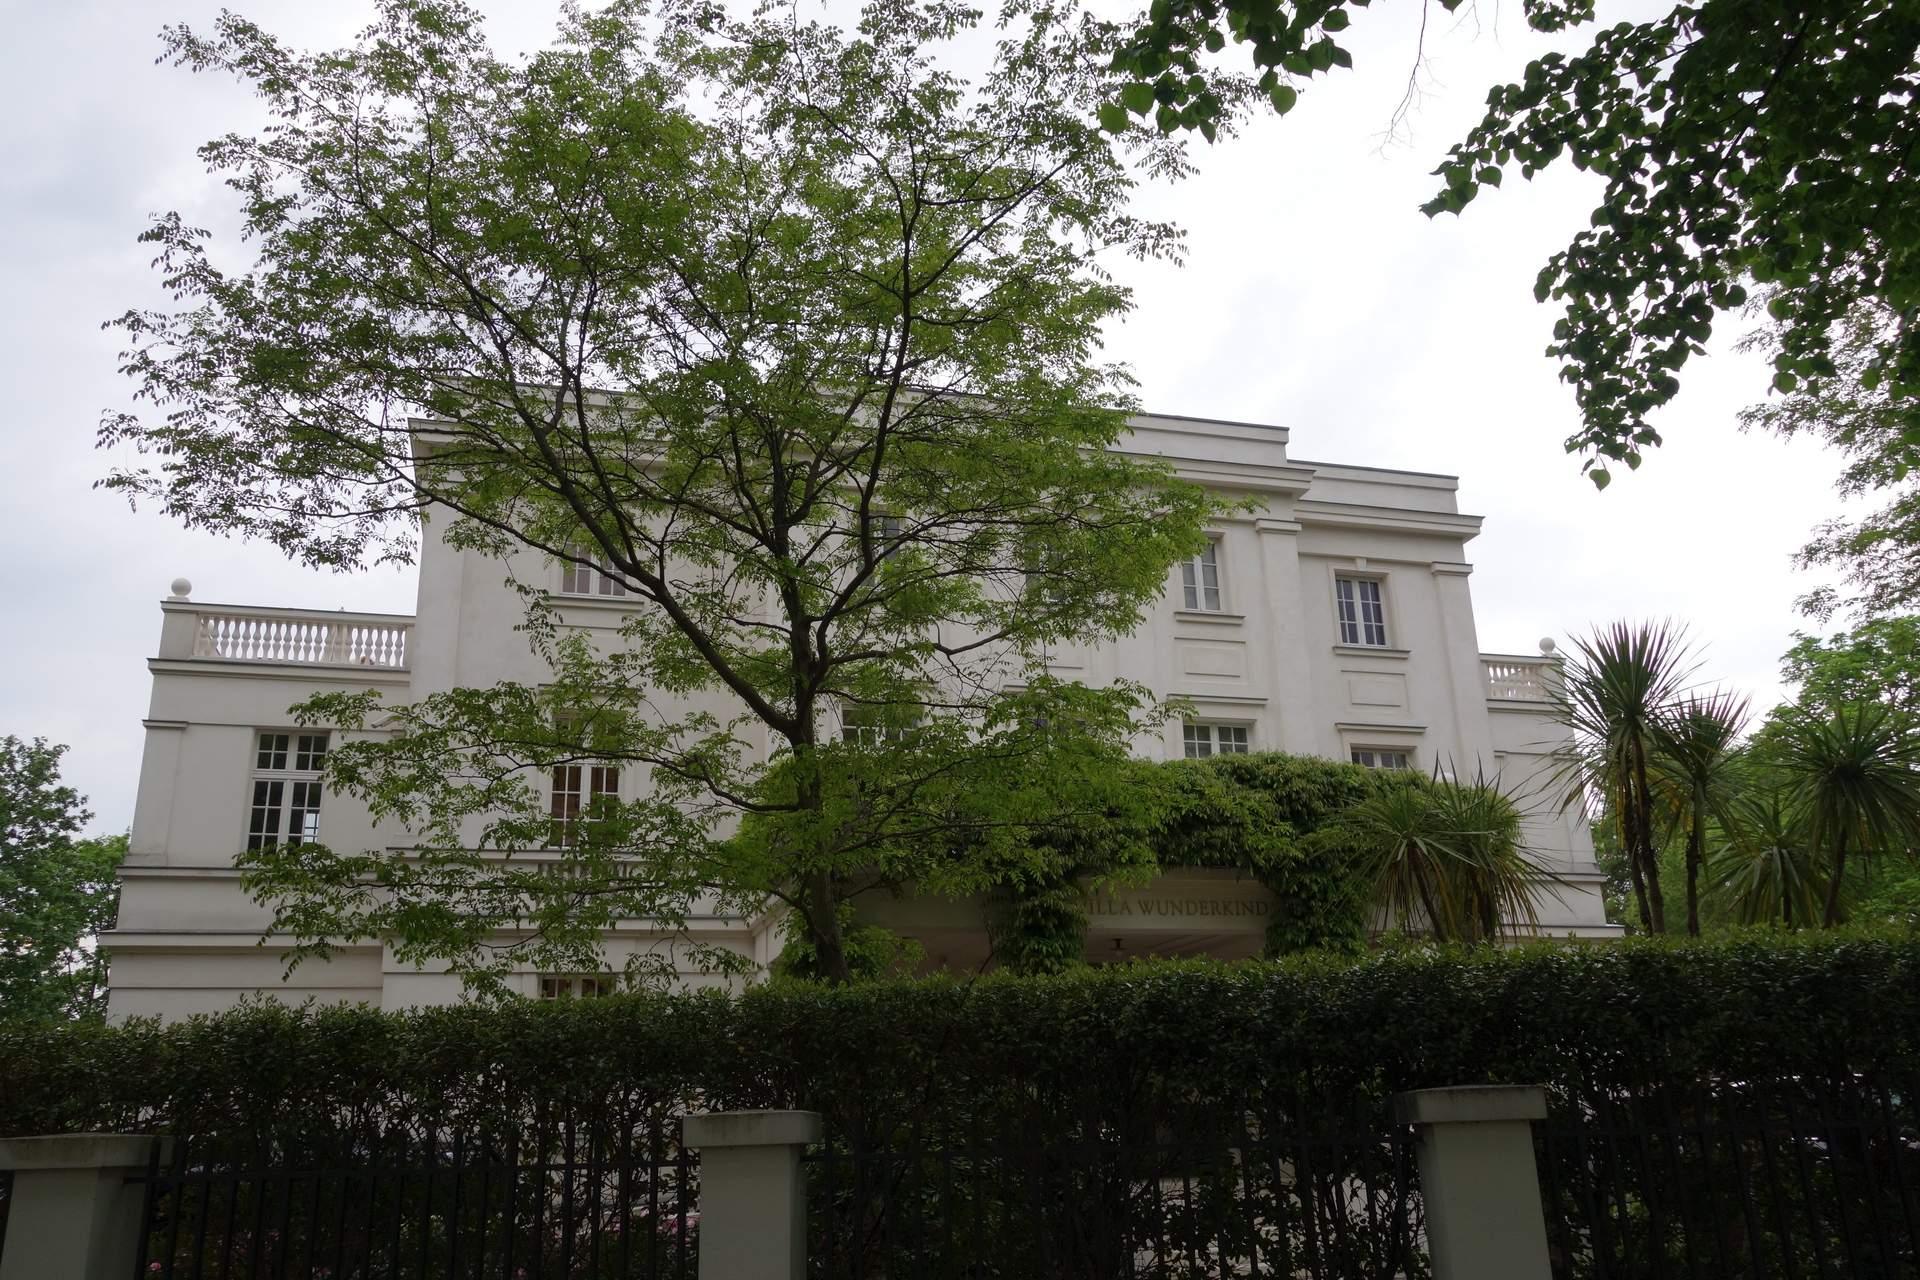 Villa Wunderkind